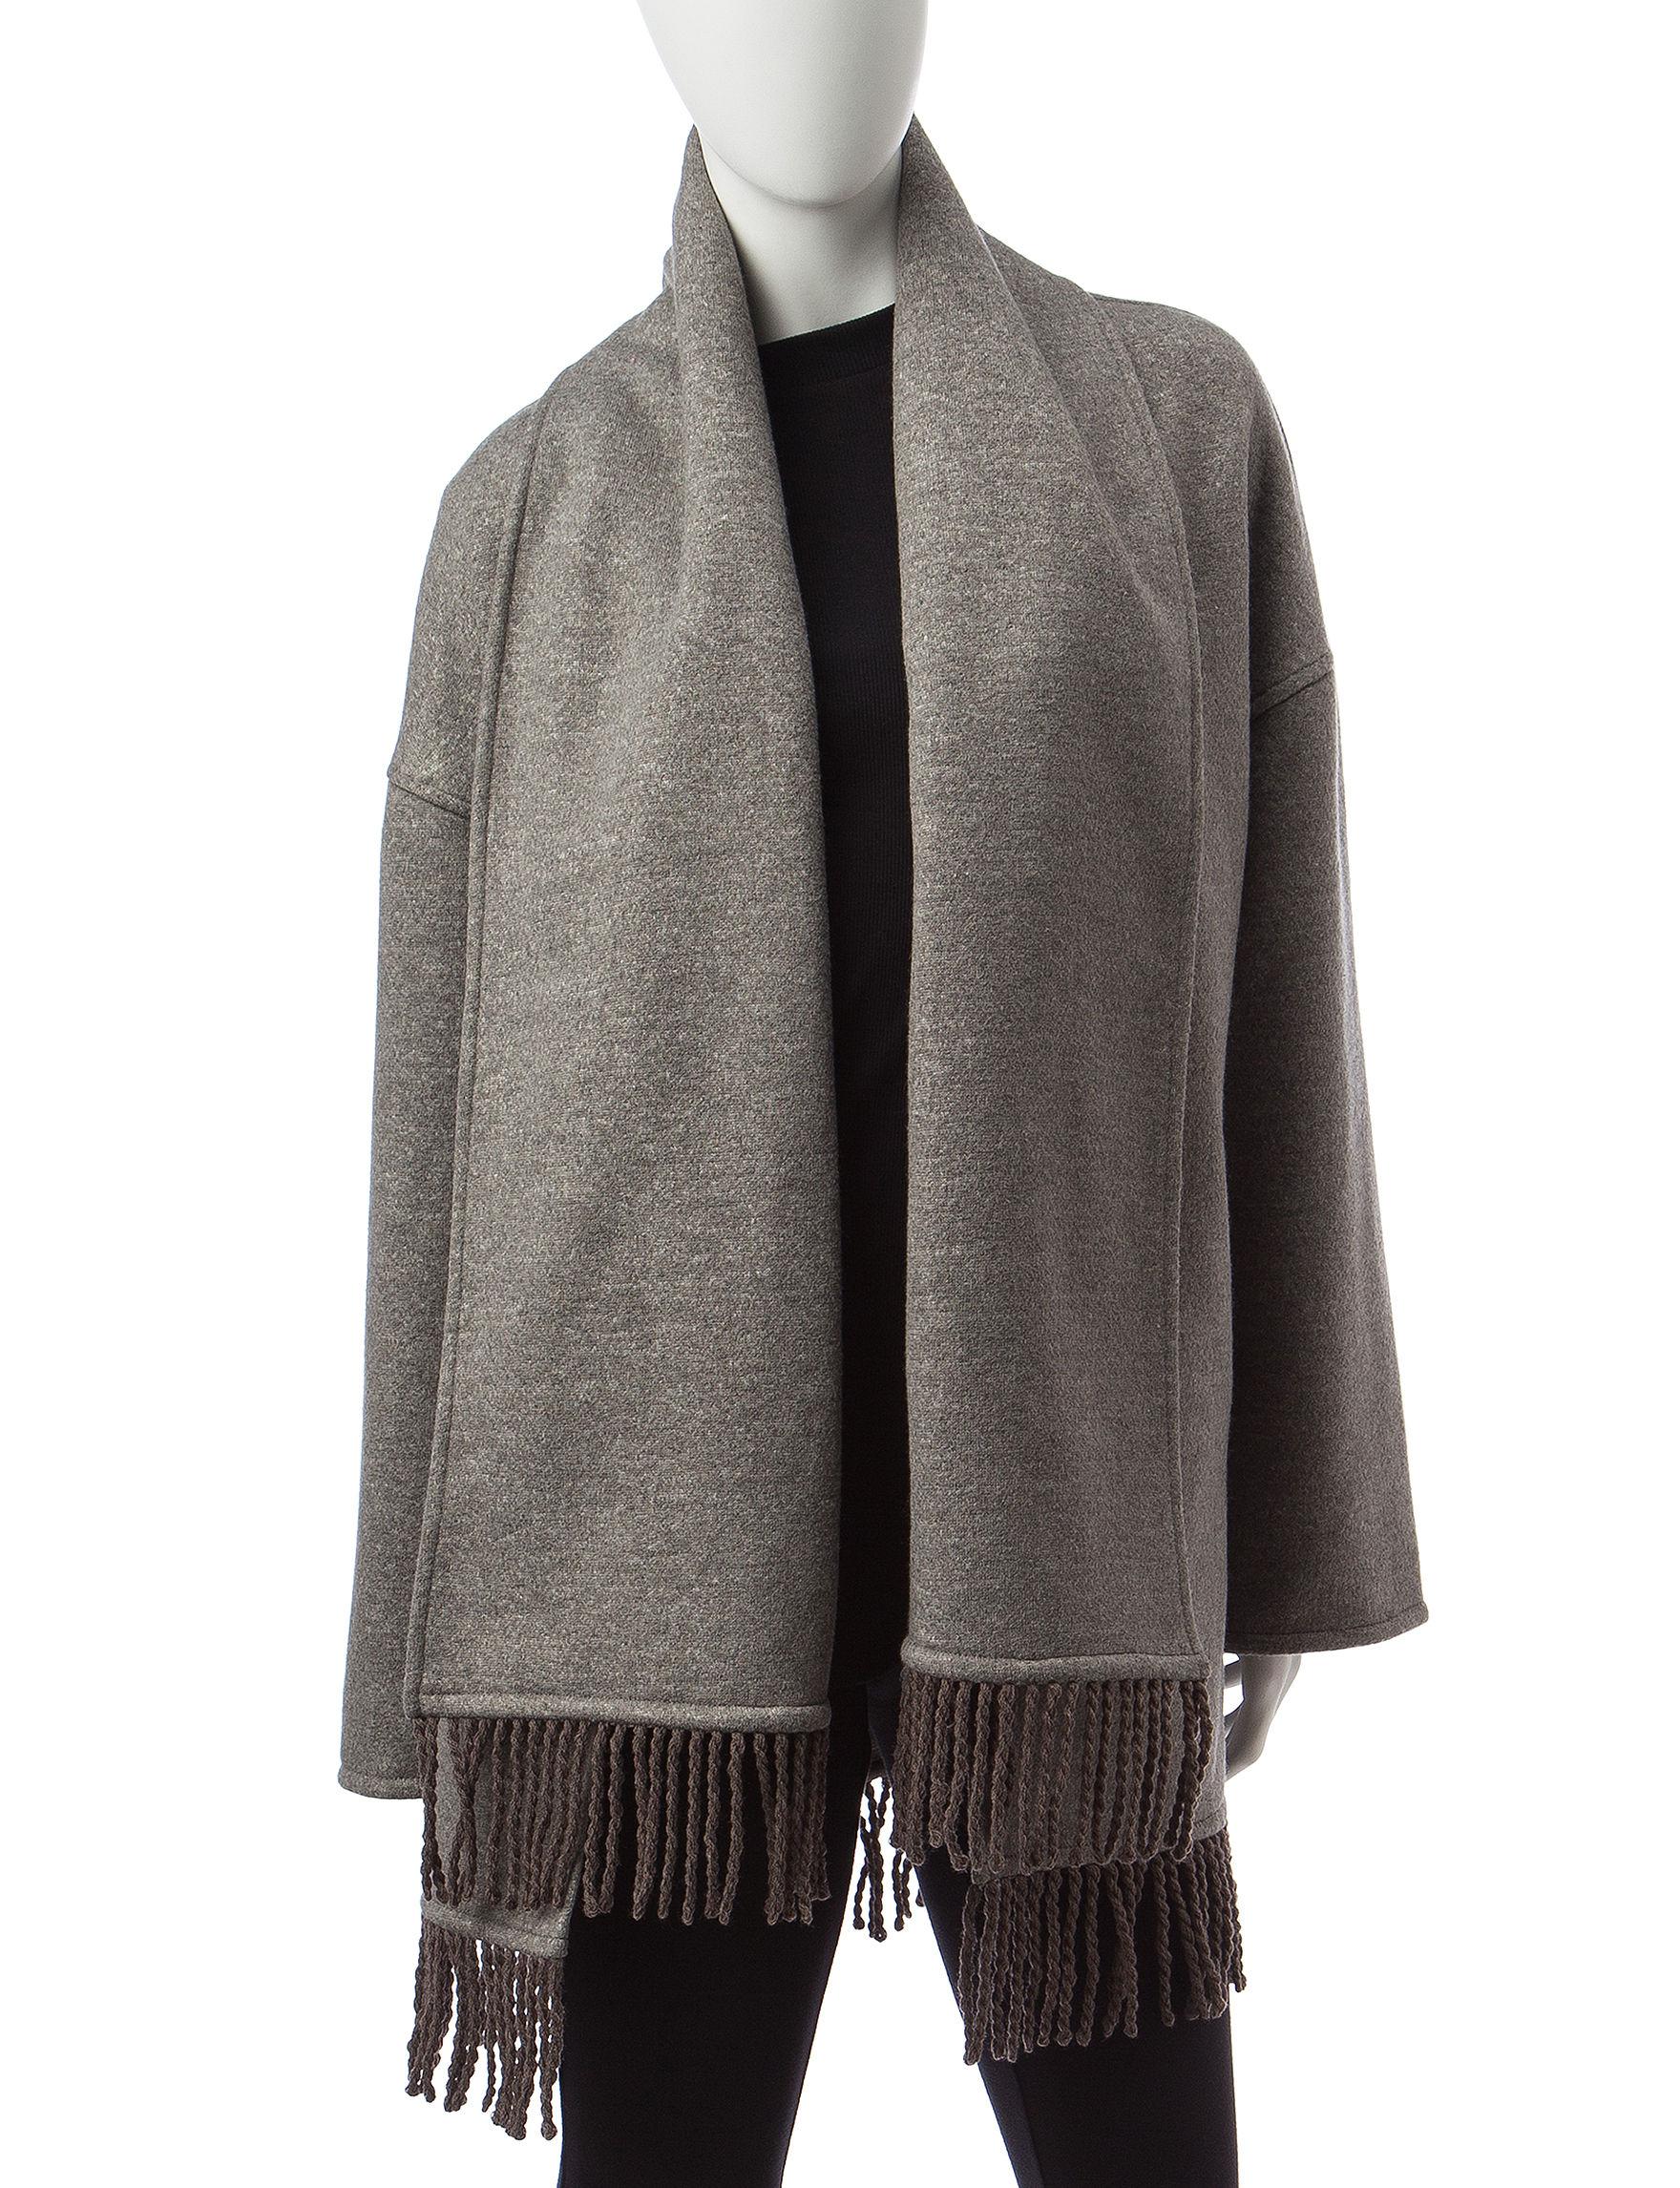 Valerie Stevens Grey Peacoats & Overcoats